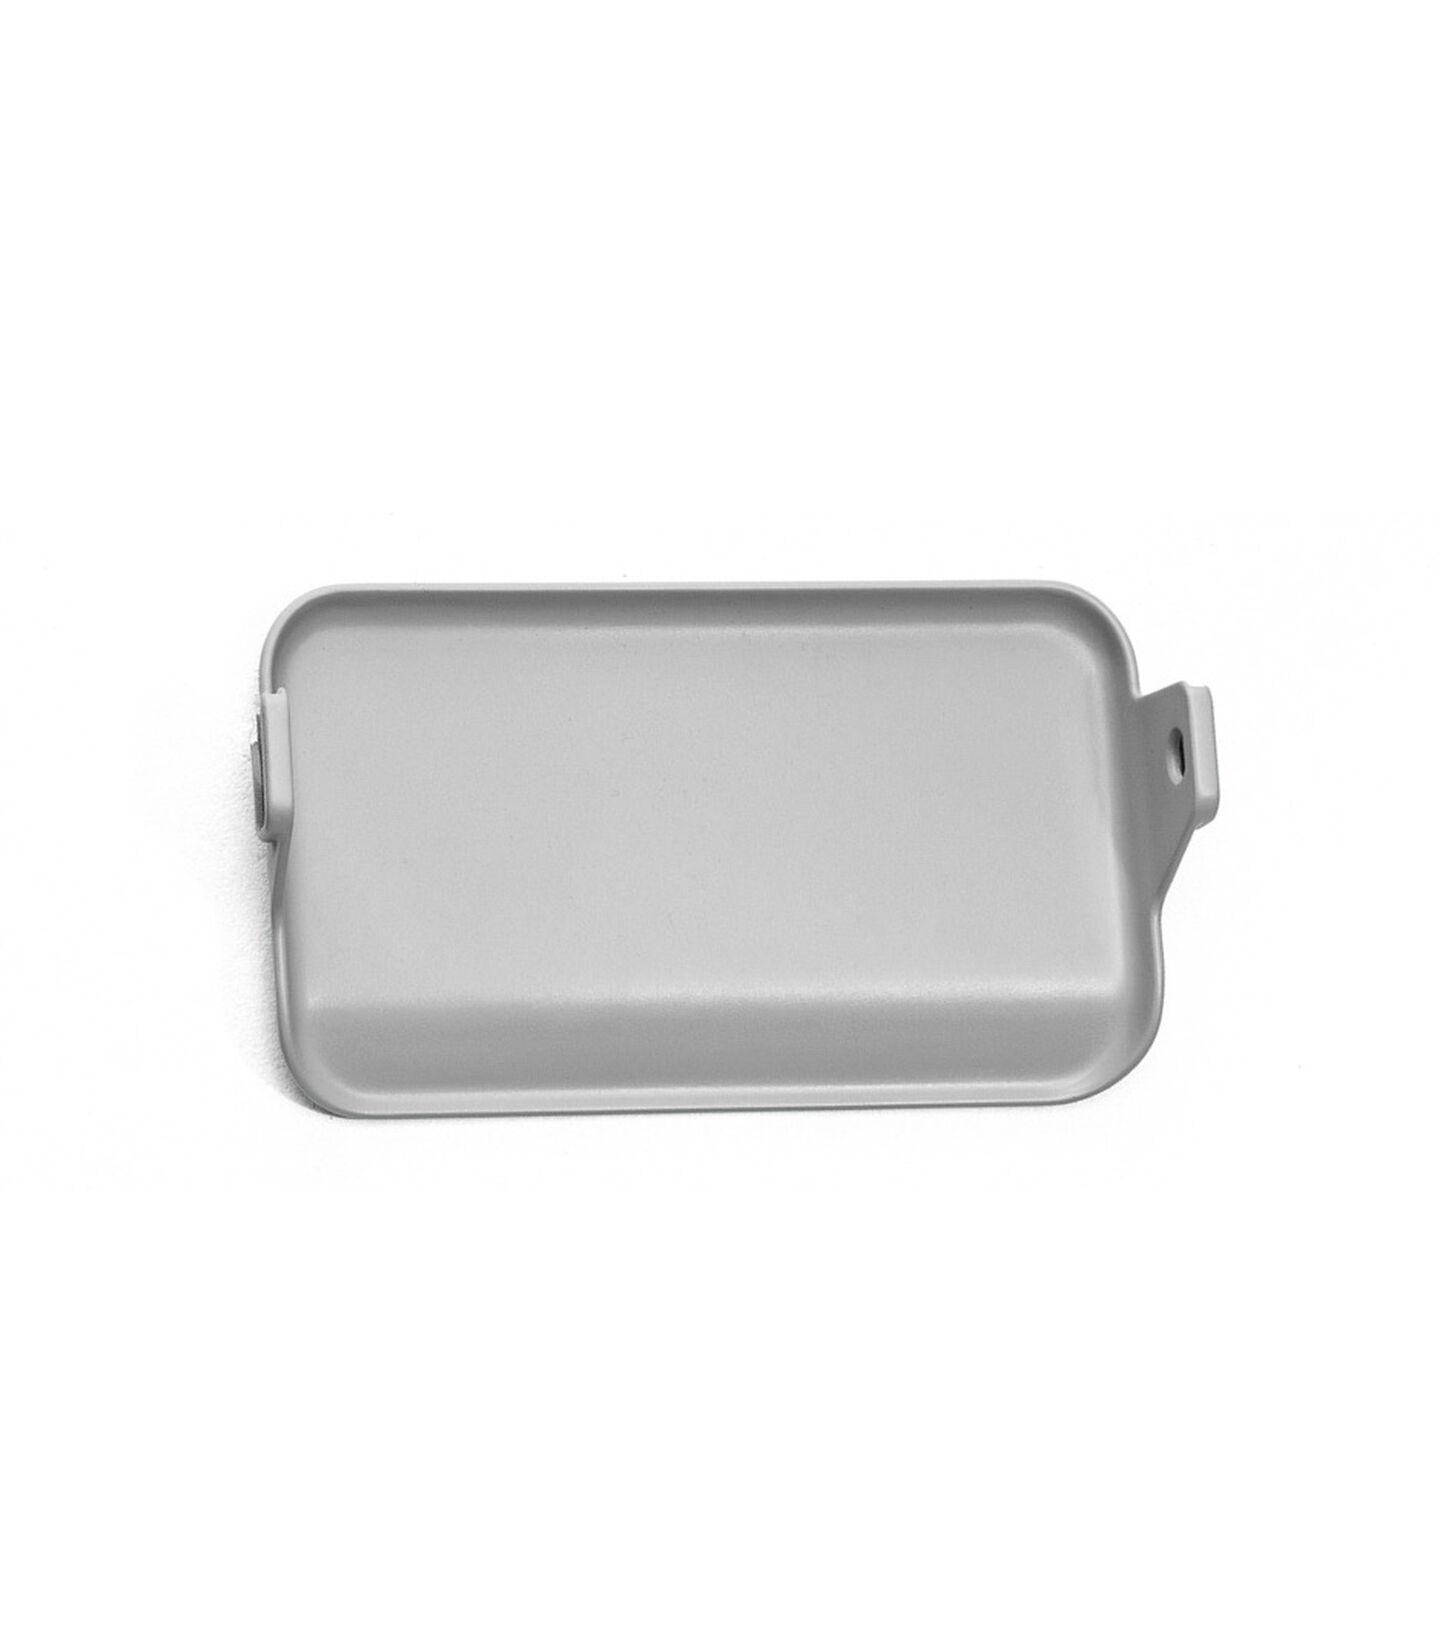 Stokke® Clikk™ Fußstütze - Cloud Grey, Cloud Grey, mainview view 1